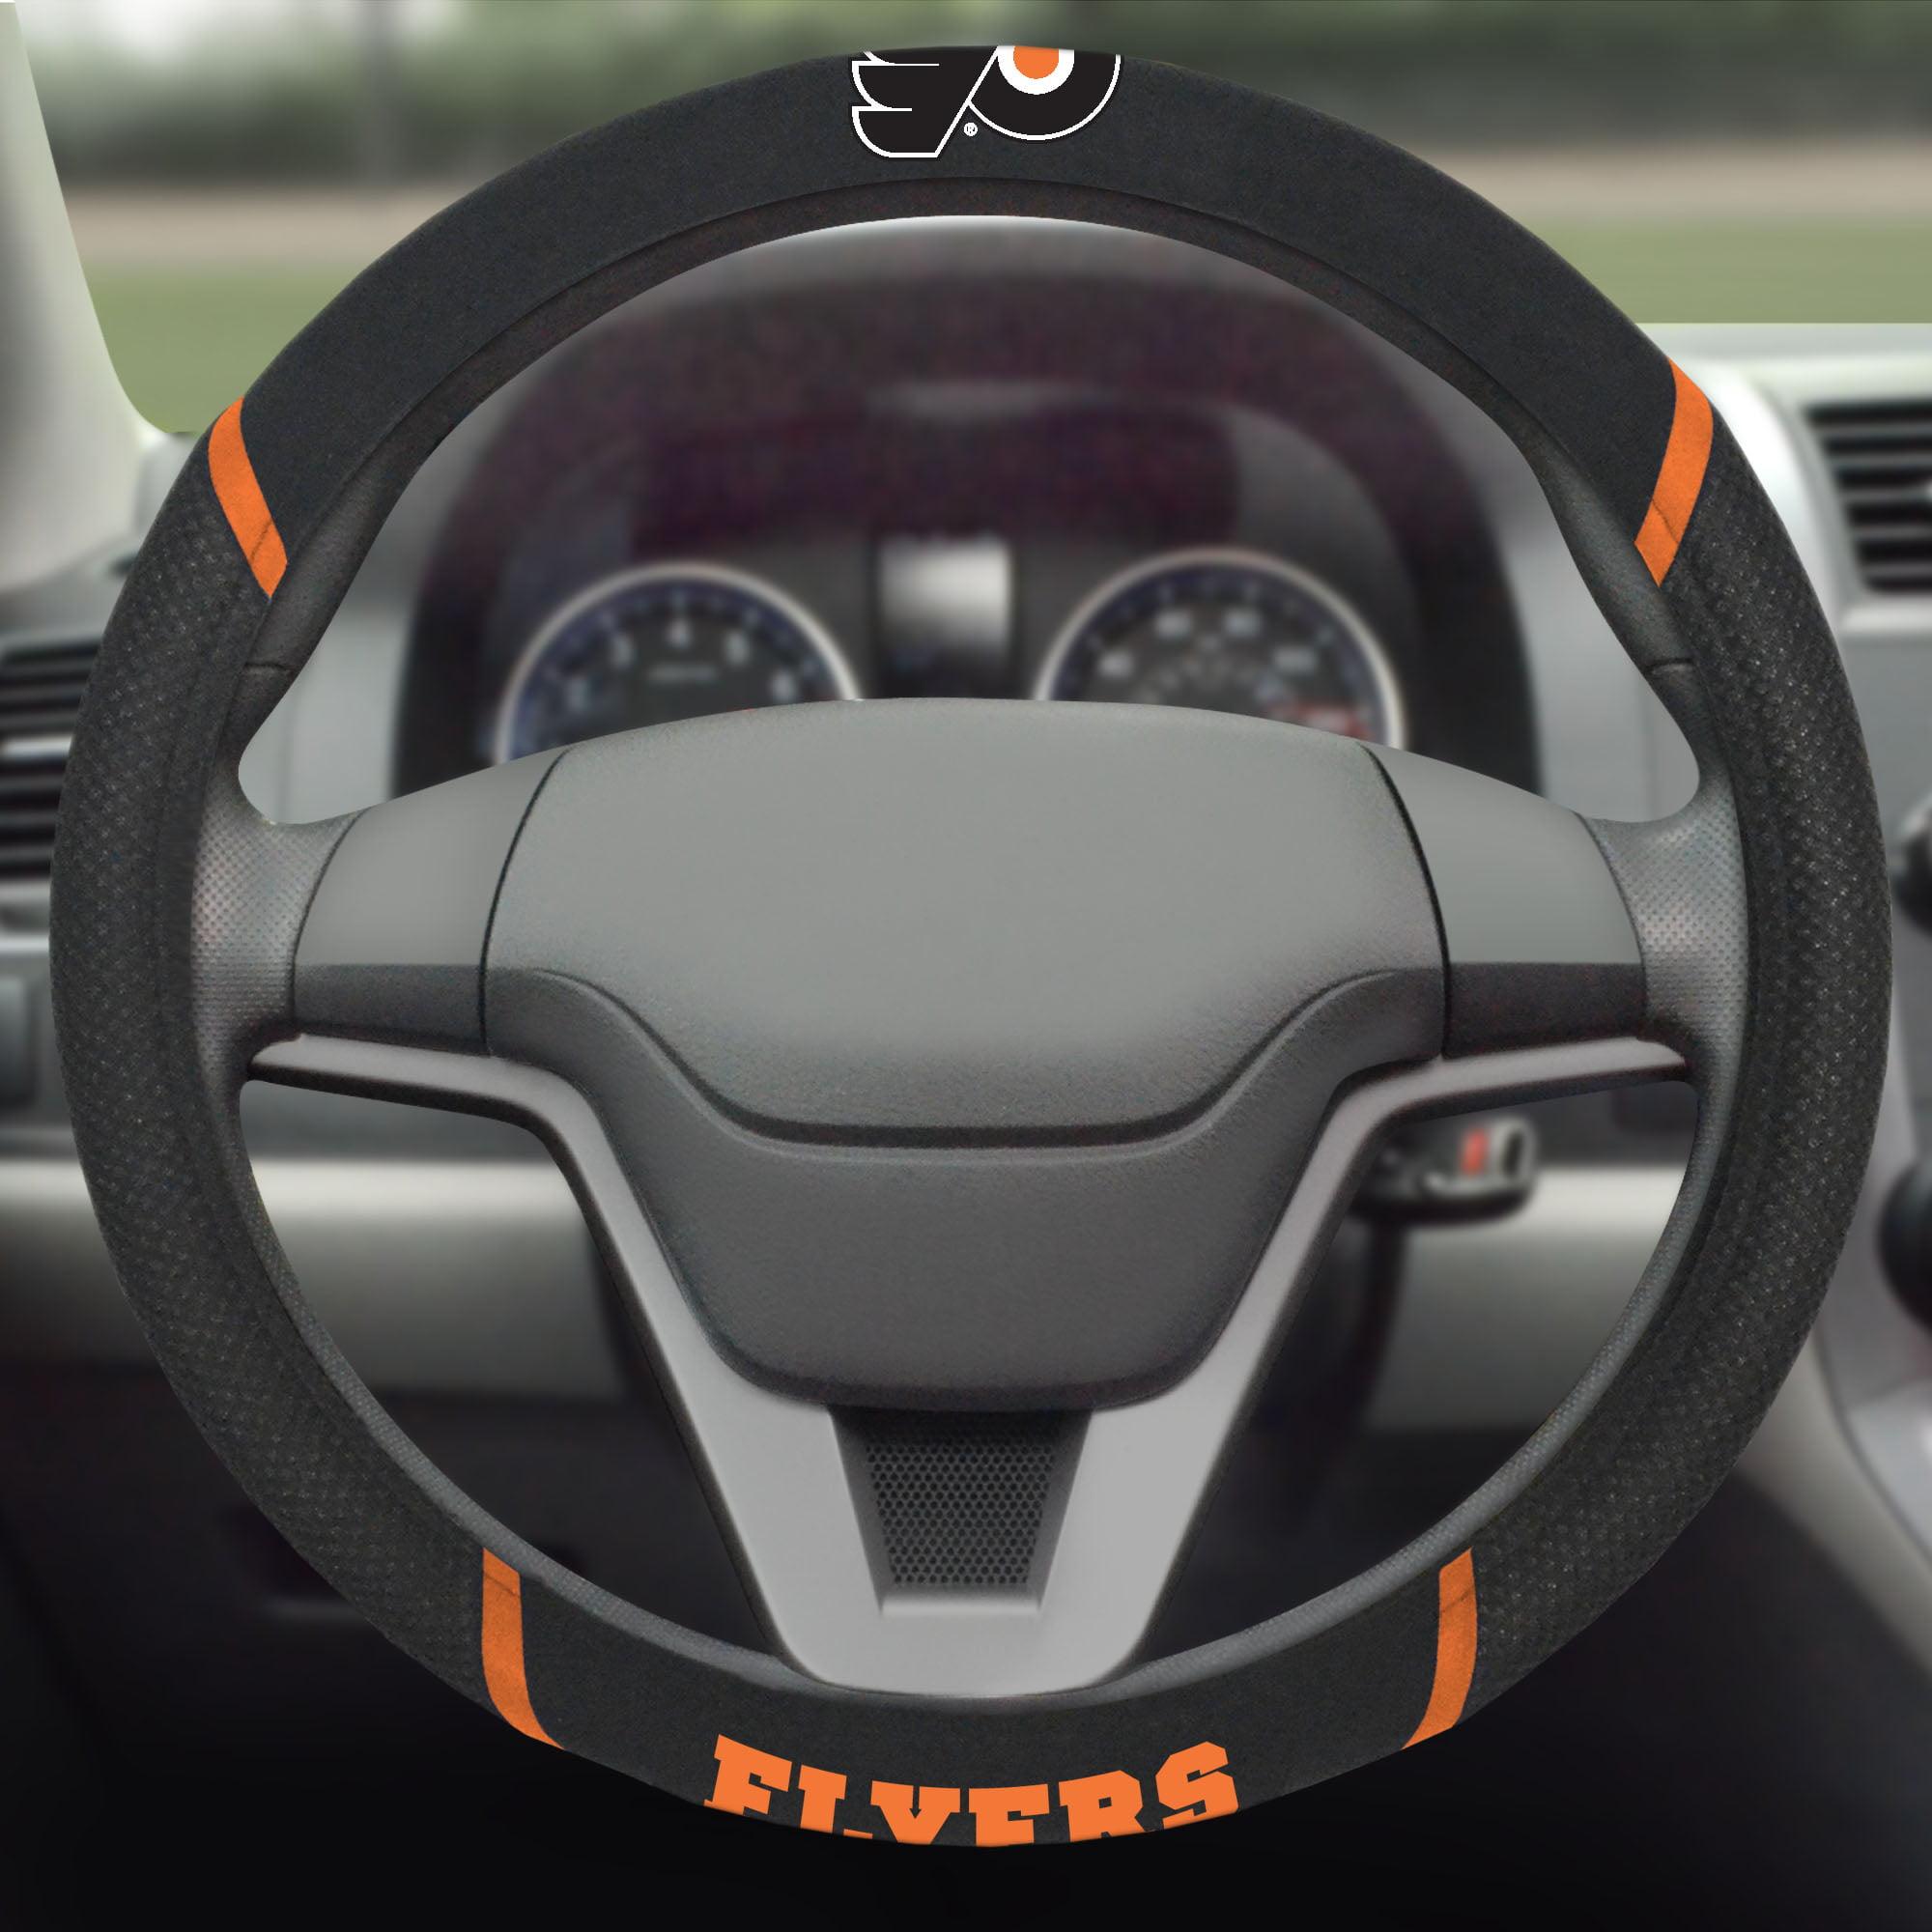 Philadelphia Flyers Steering Wheel Cover - No Size